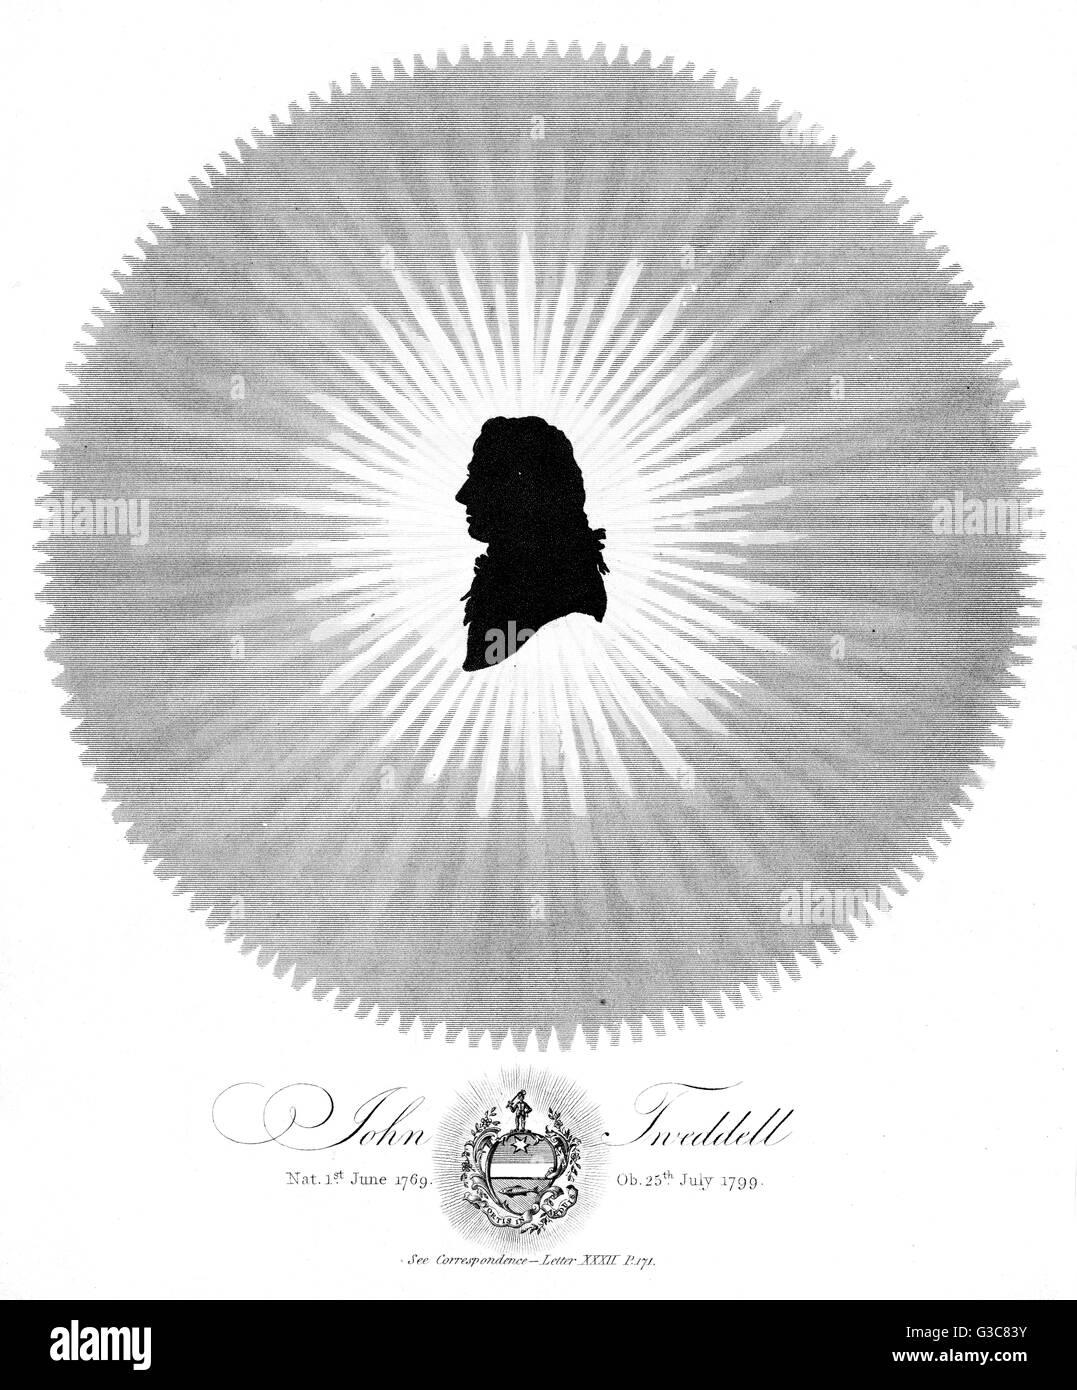 JOHN TWEDDELL scholar         Date: 1769 - 1799 - Stock Image